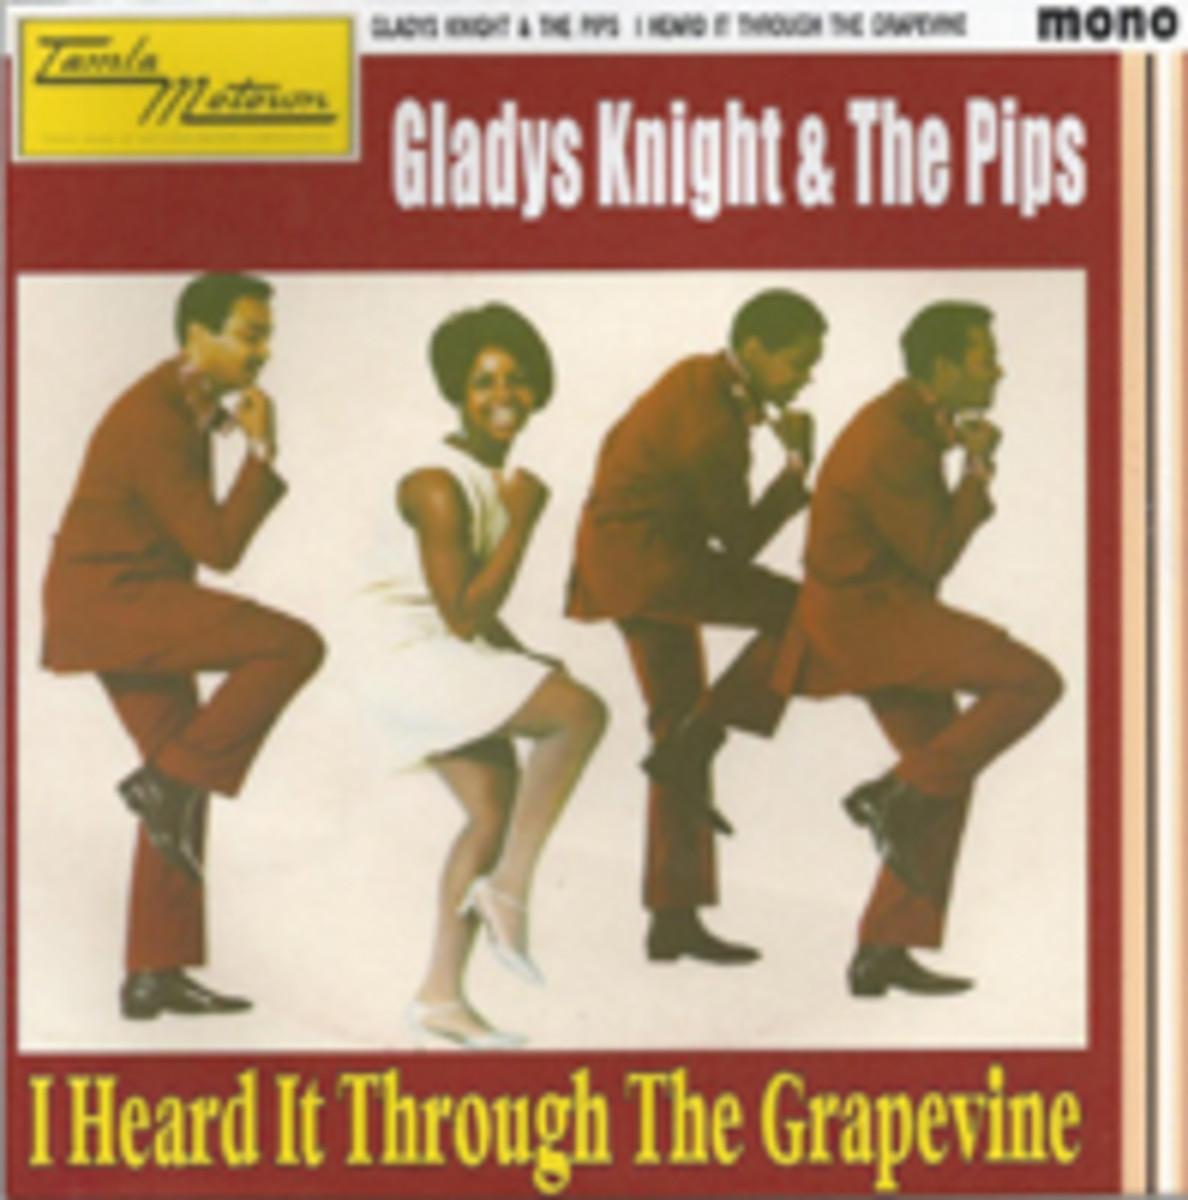 GladysKnight_PS_Grapevine